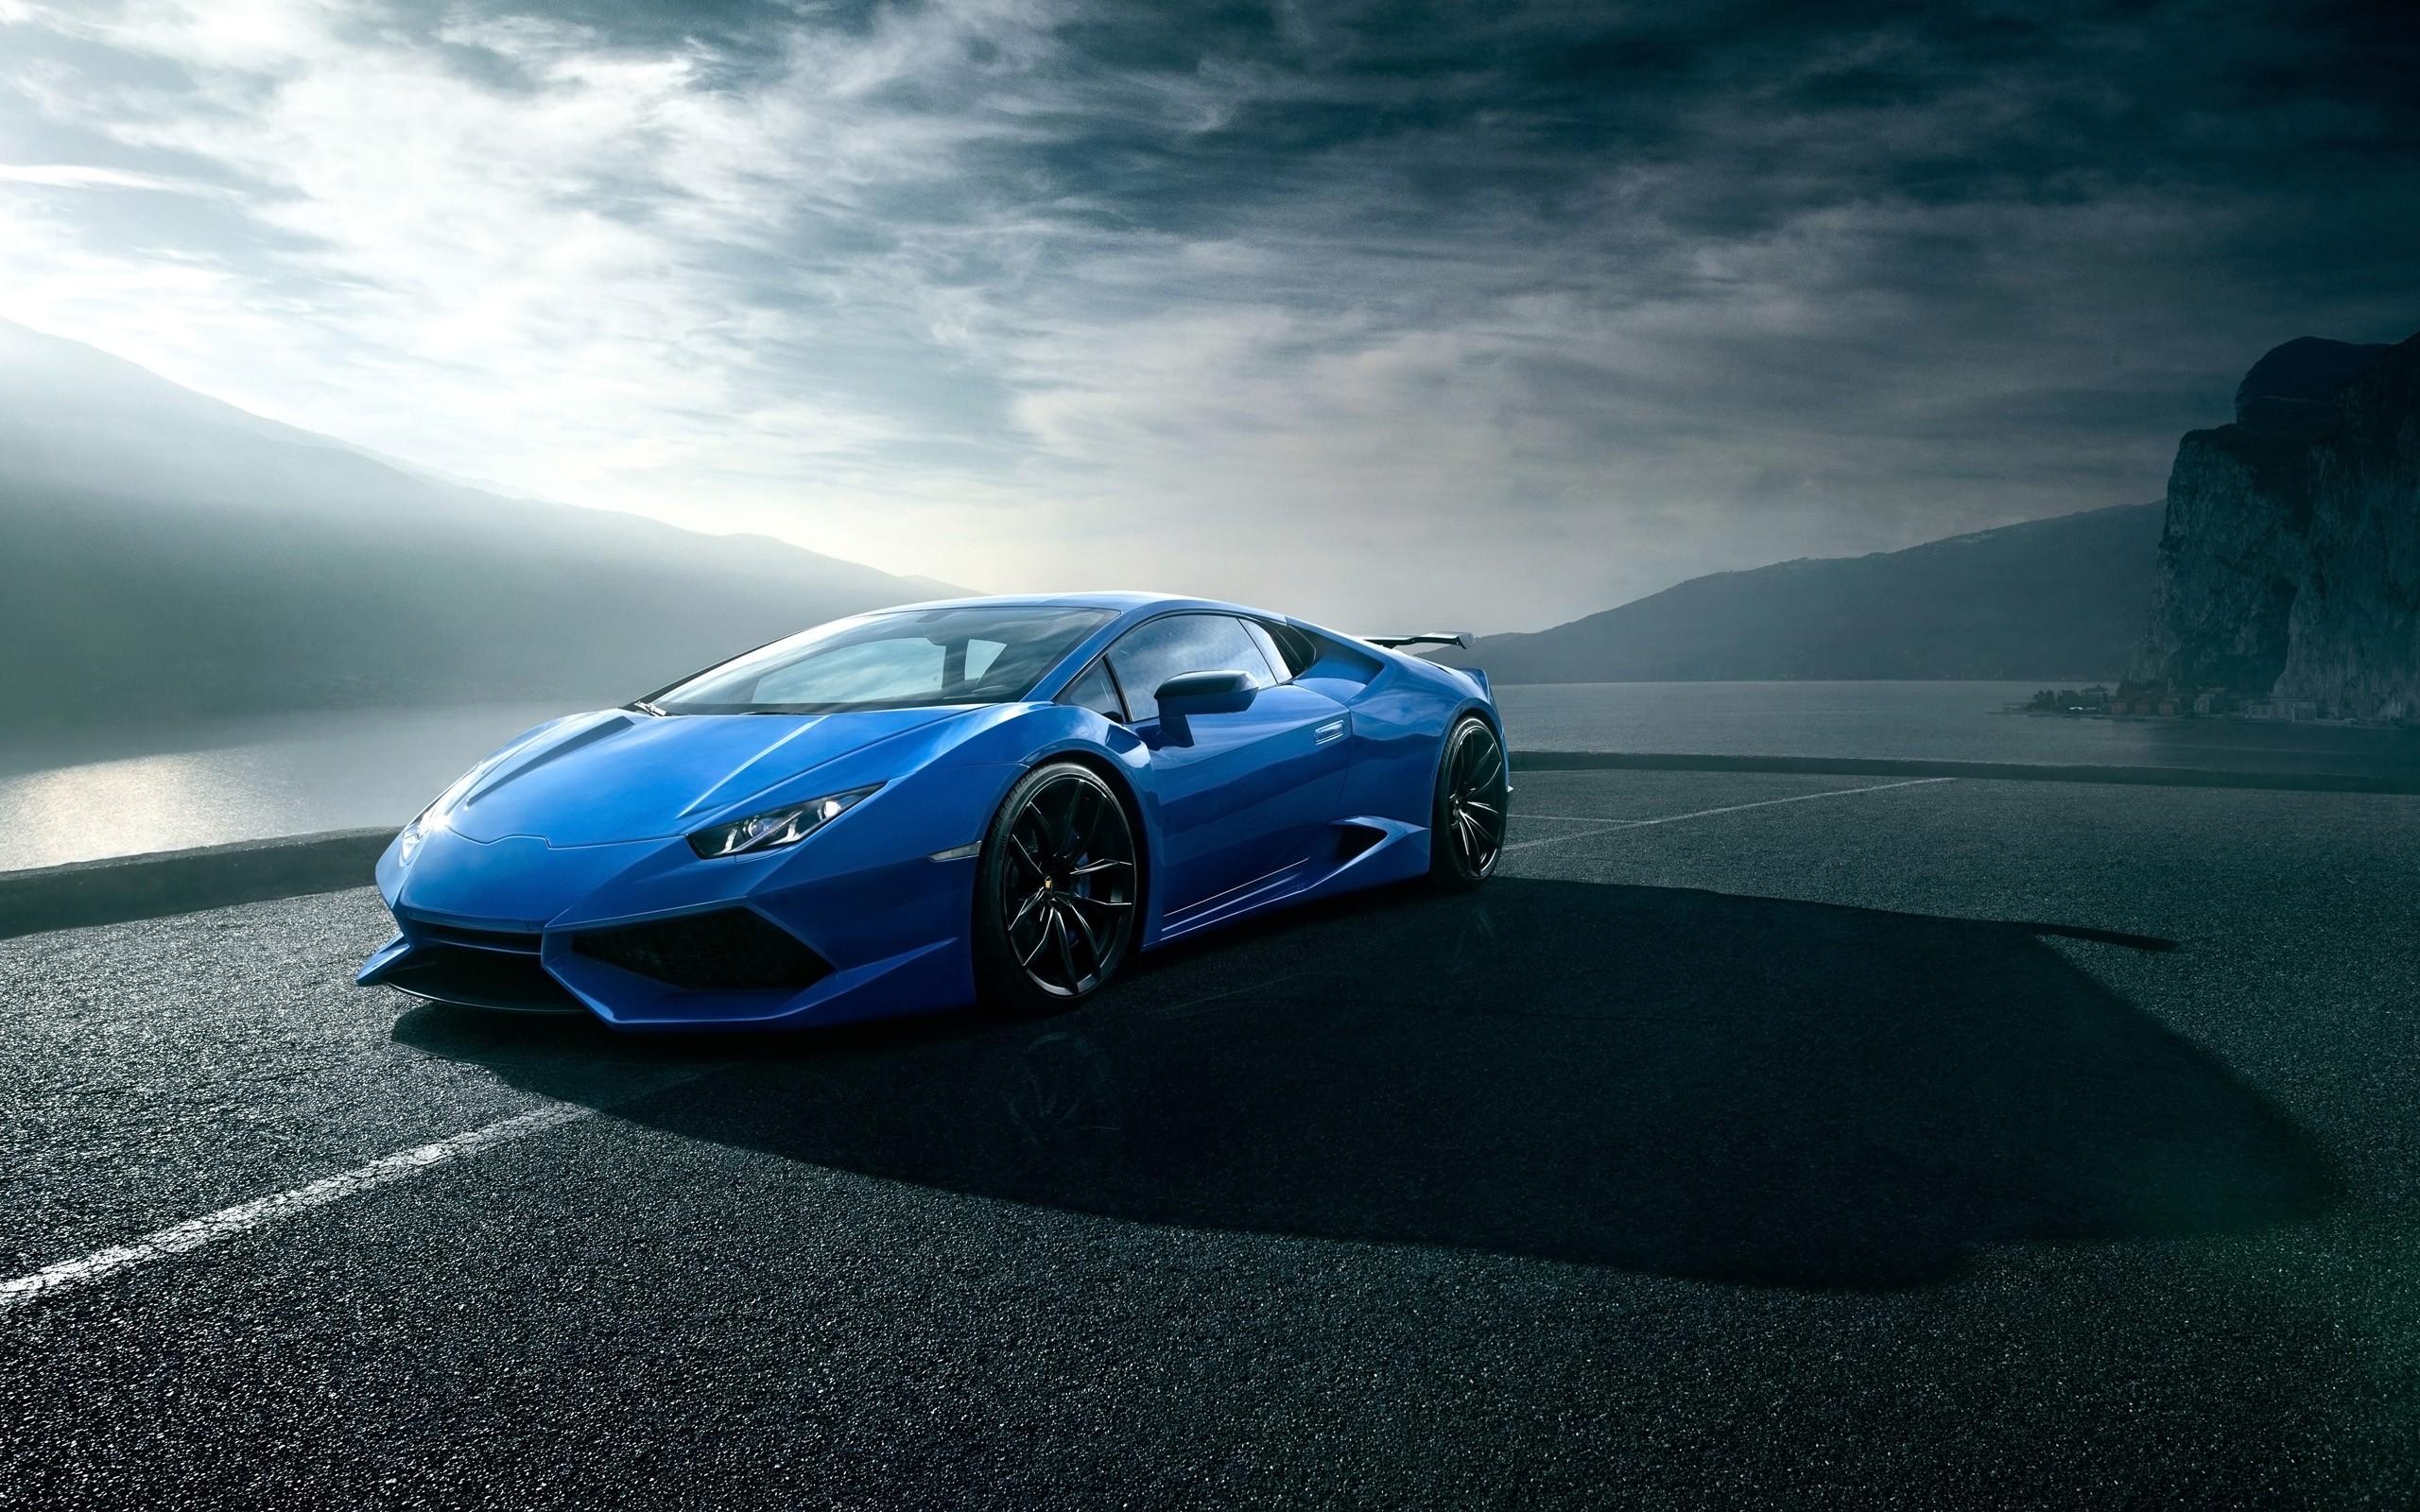 Blue Car Iphone Wallpaper 2015 Novitec Torado Lamborghini Huracan N Largo 8